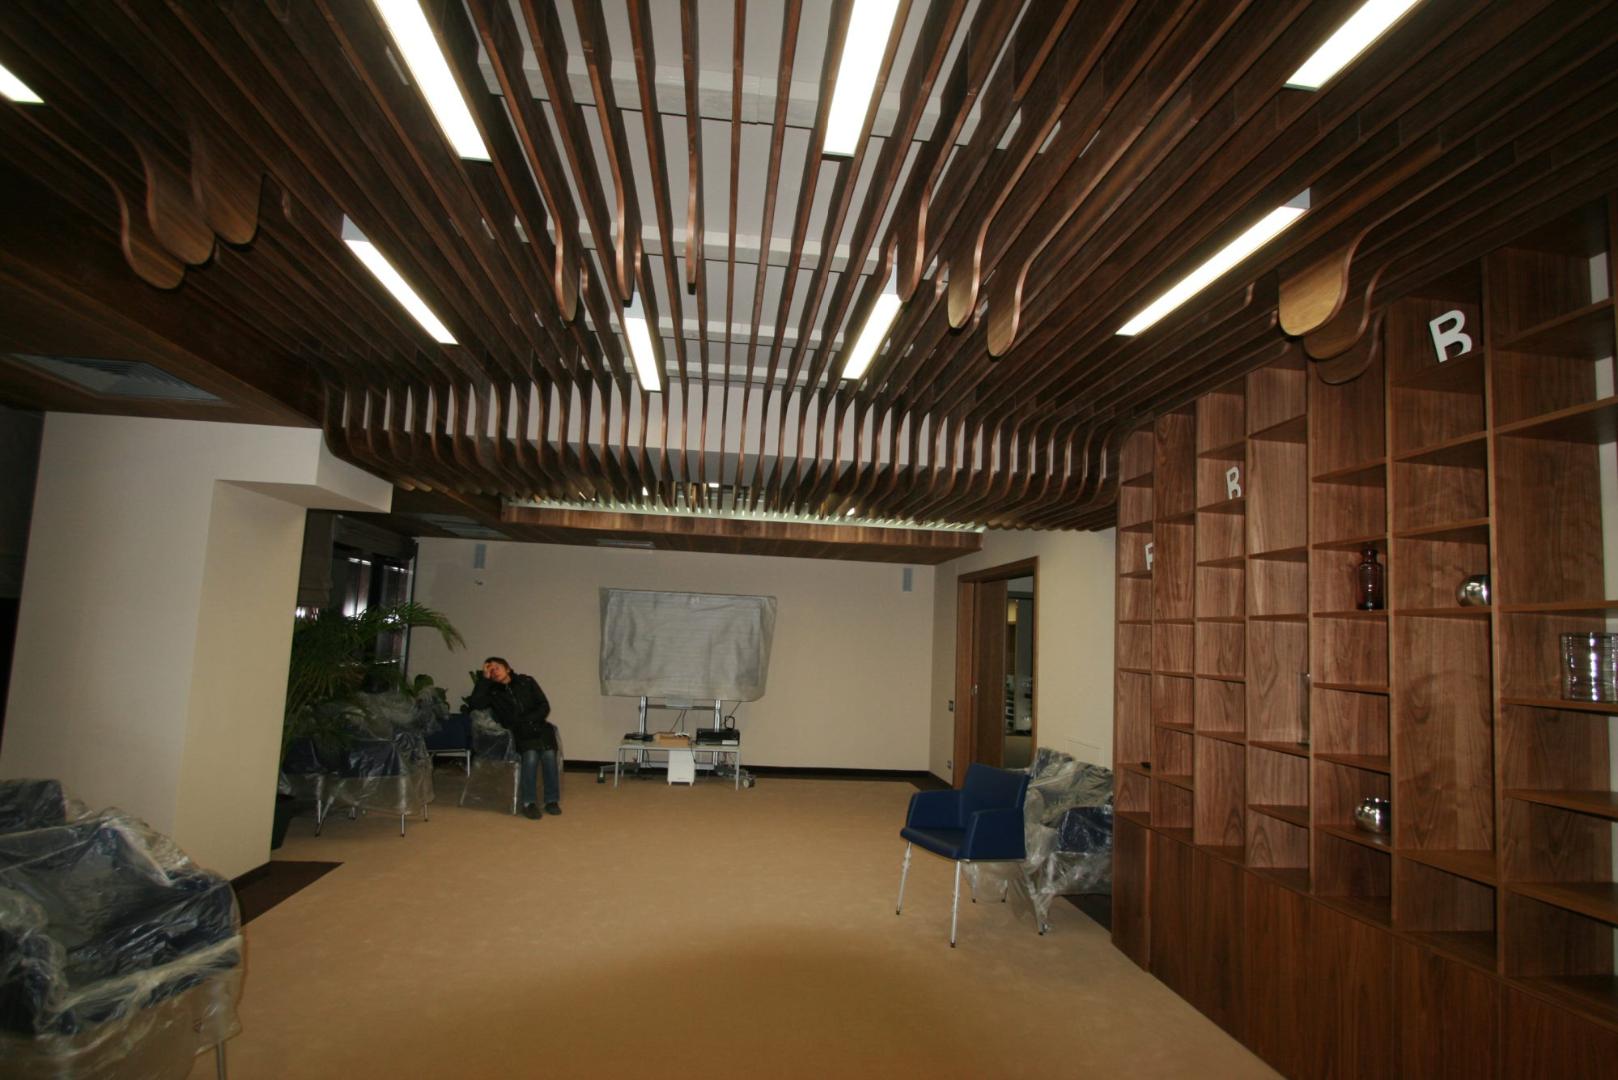 placari pereti corian iluminat led receptie corian termoformat furnir tavan furnir nuc tridimensional mobilier trafoare atipic depa007